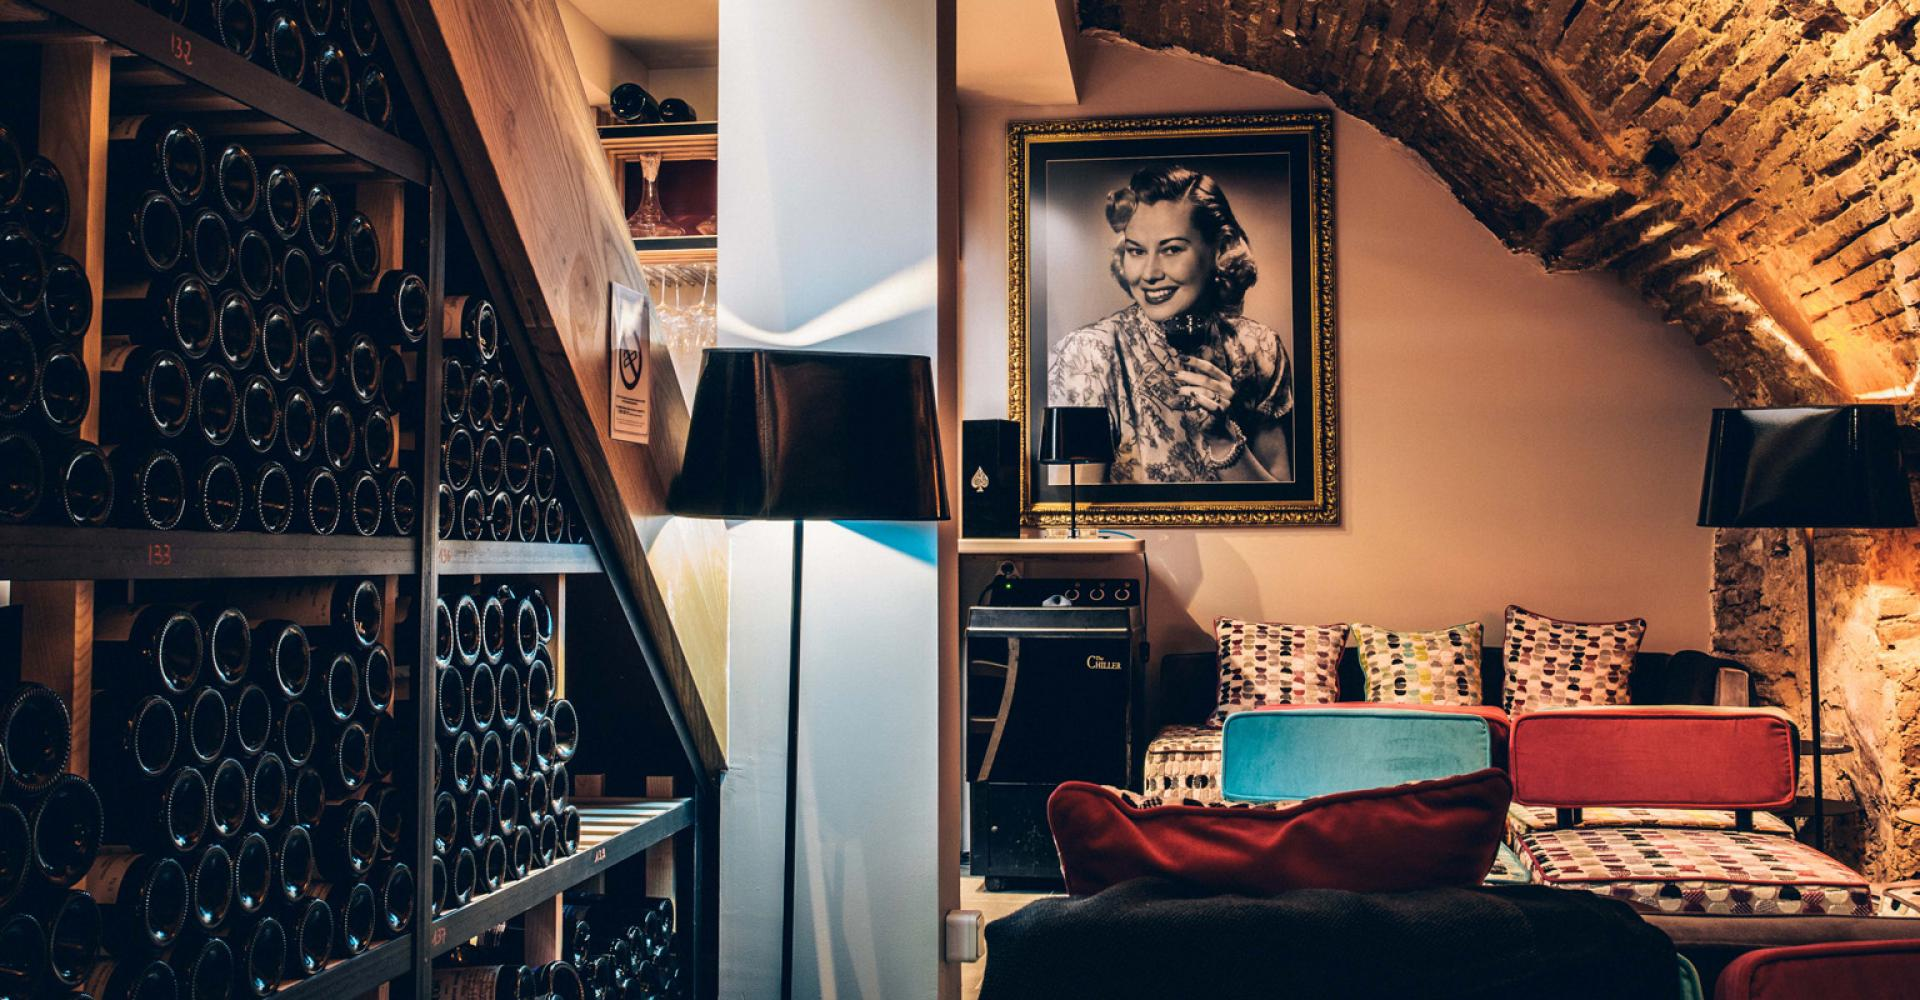 Le N°5 Wine bar Toulouse